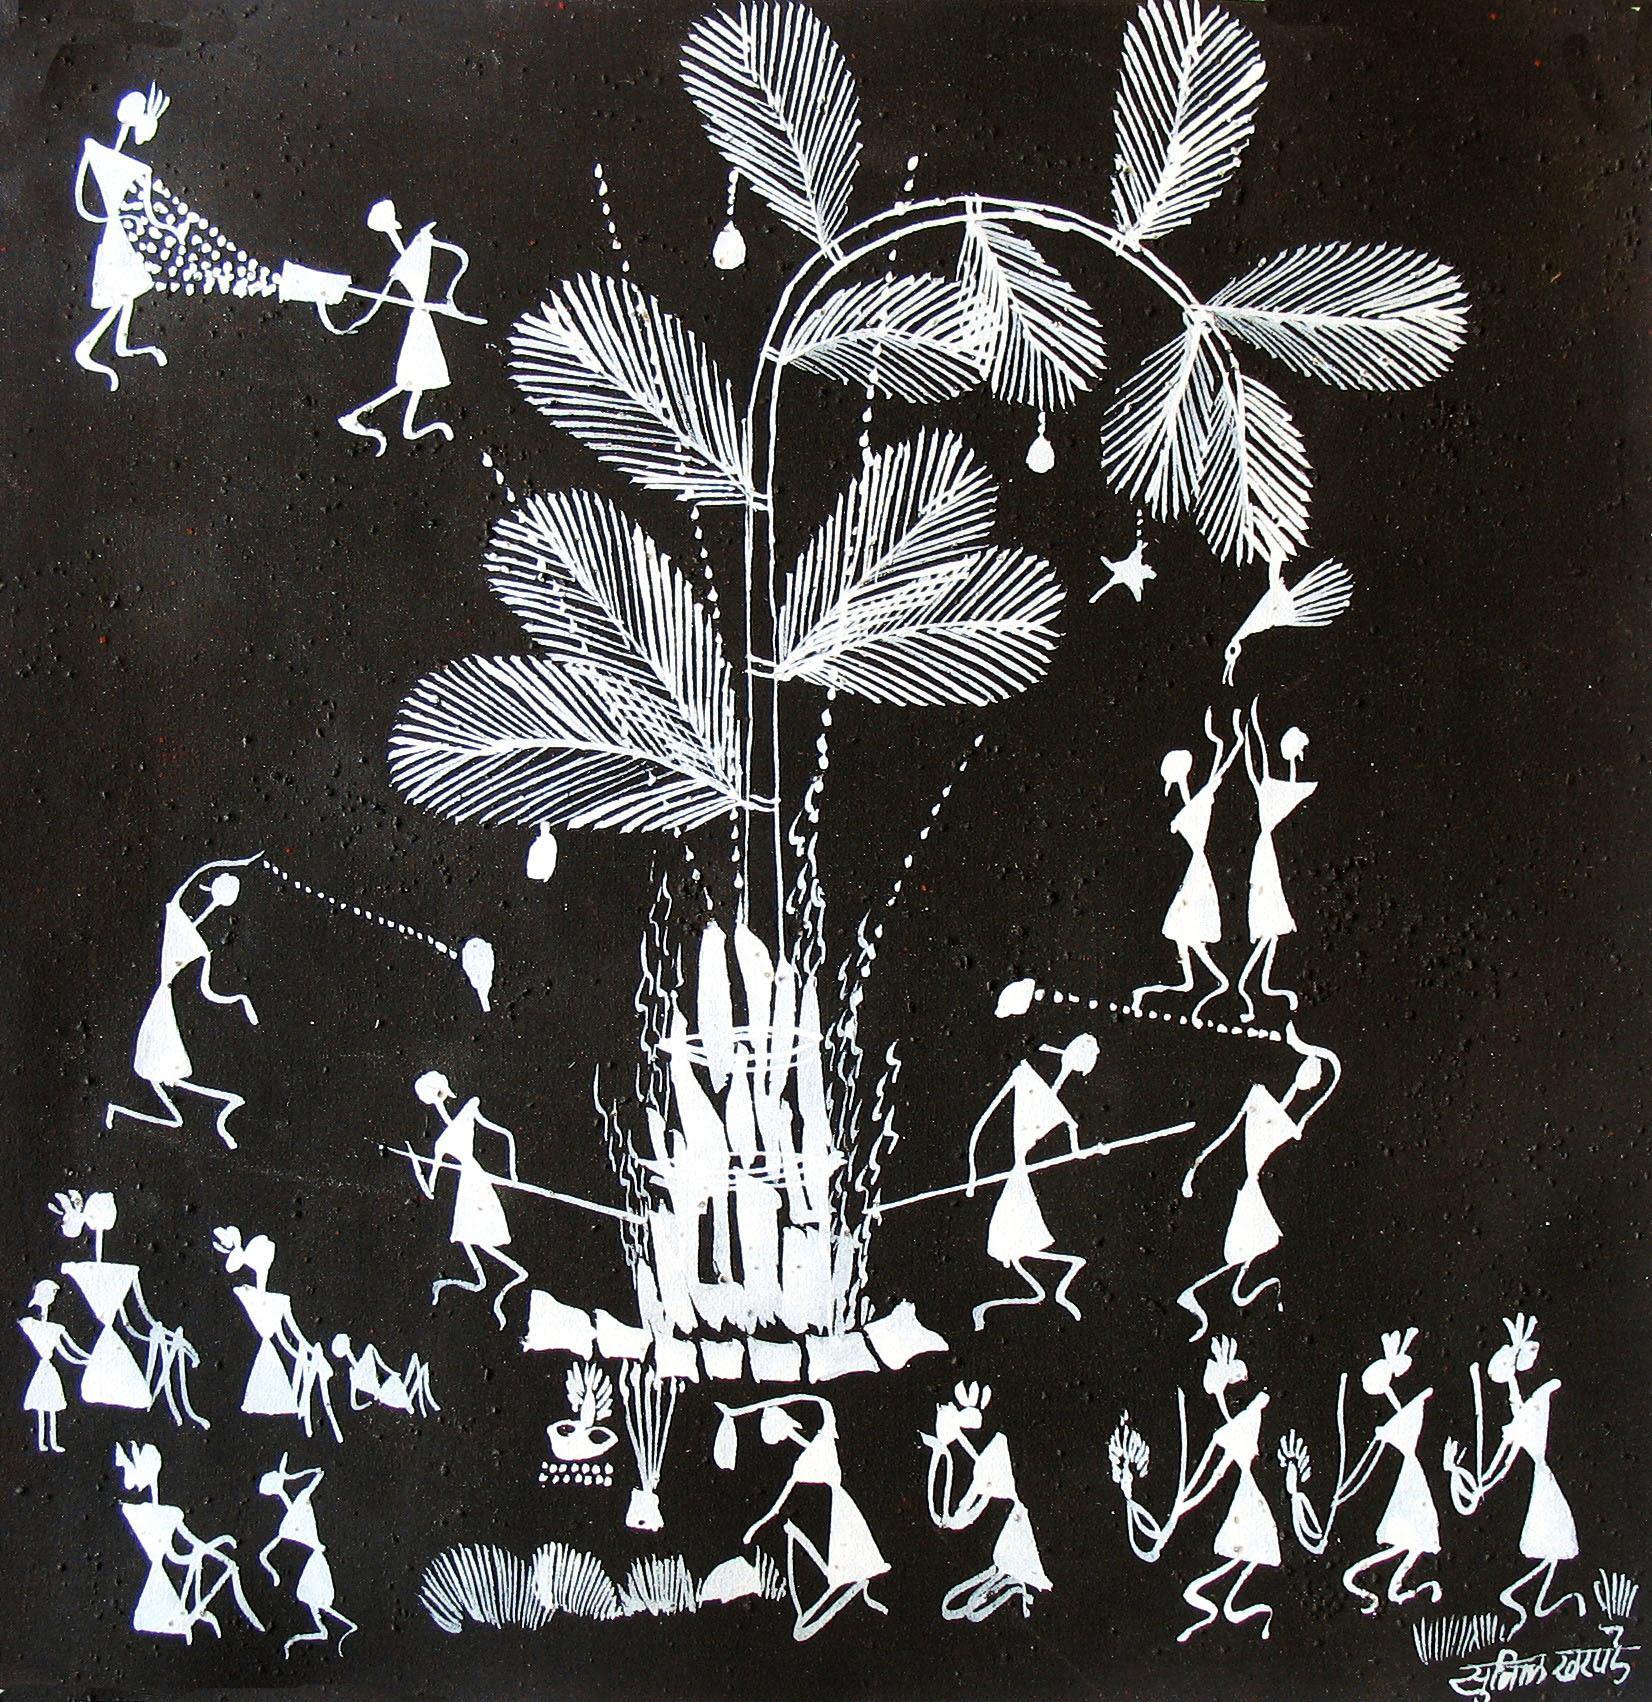 warli painting black background